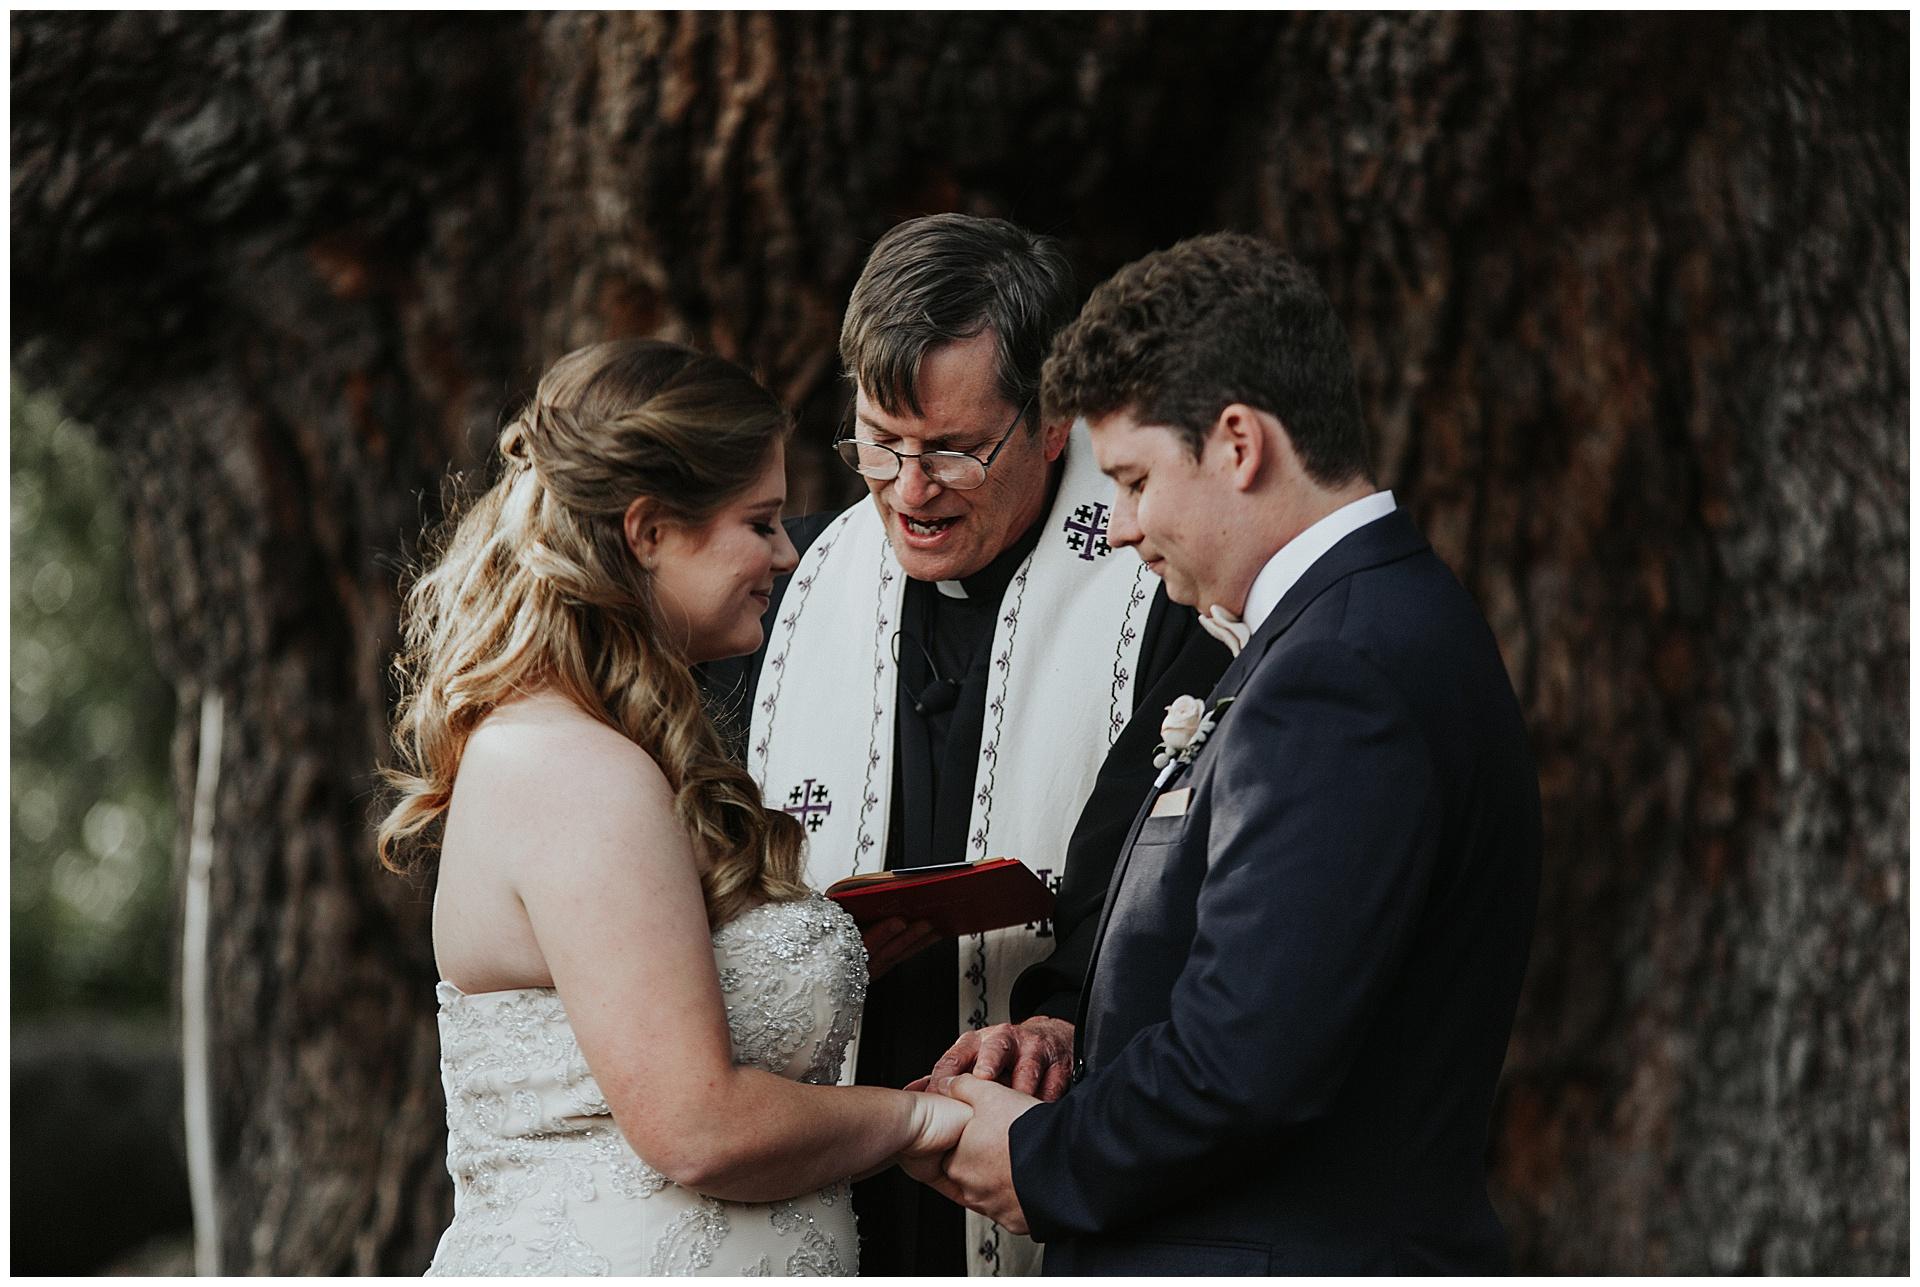 treaty oak glass factory wedding_mia dimare photography30.jpg